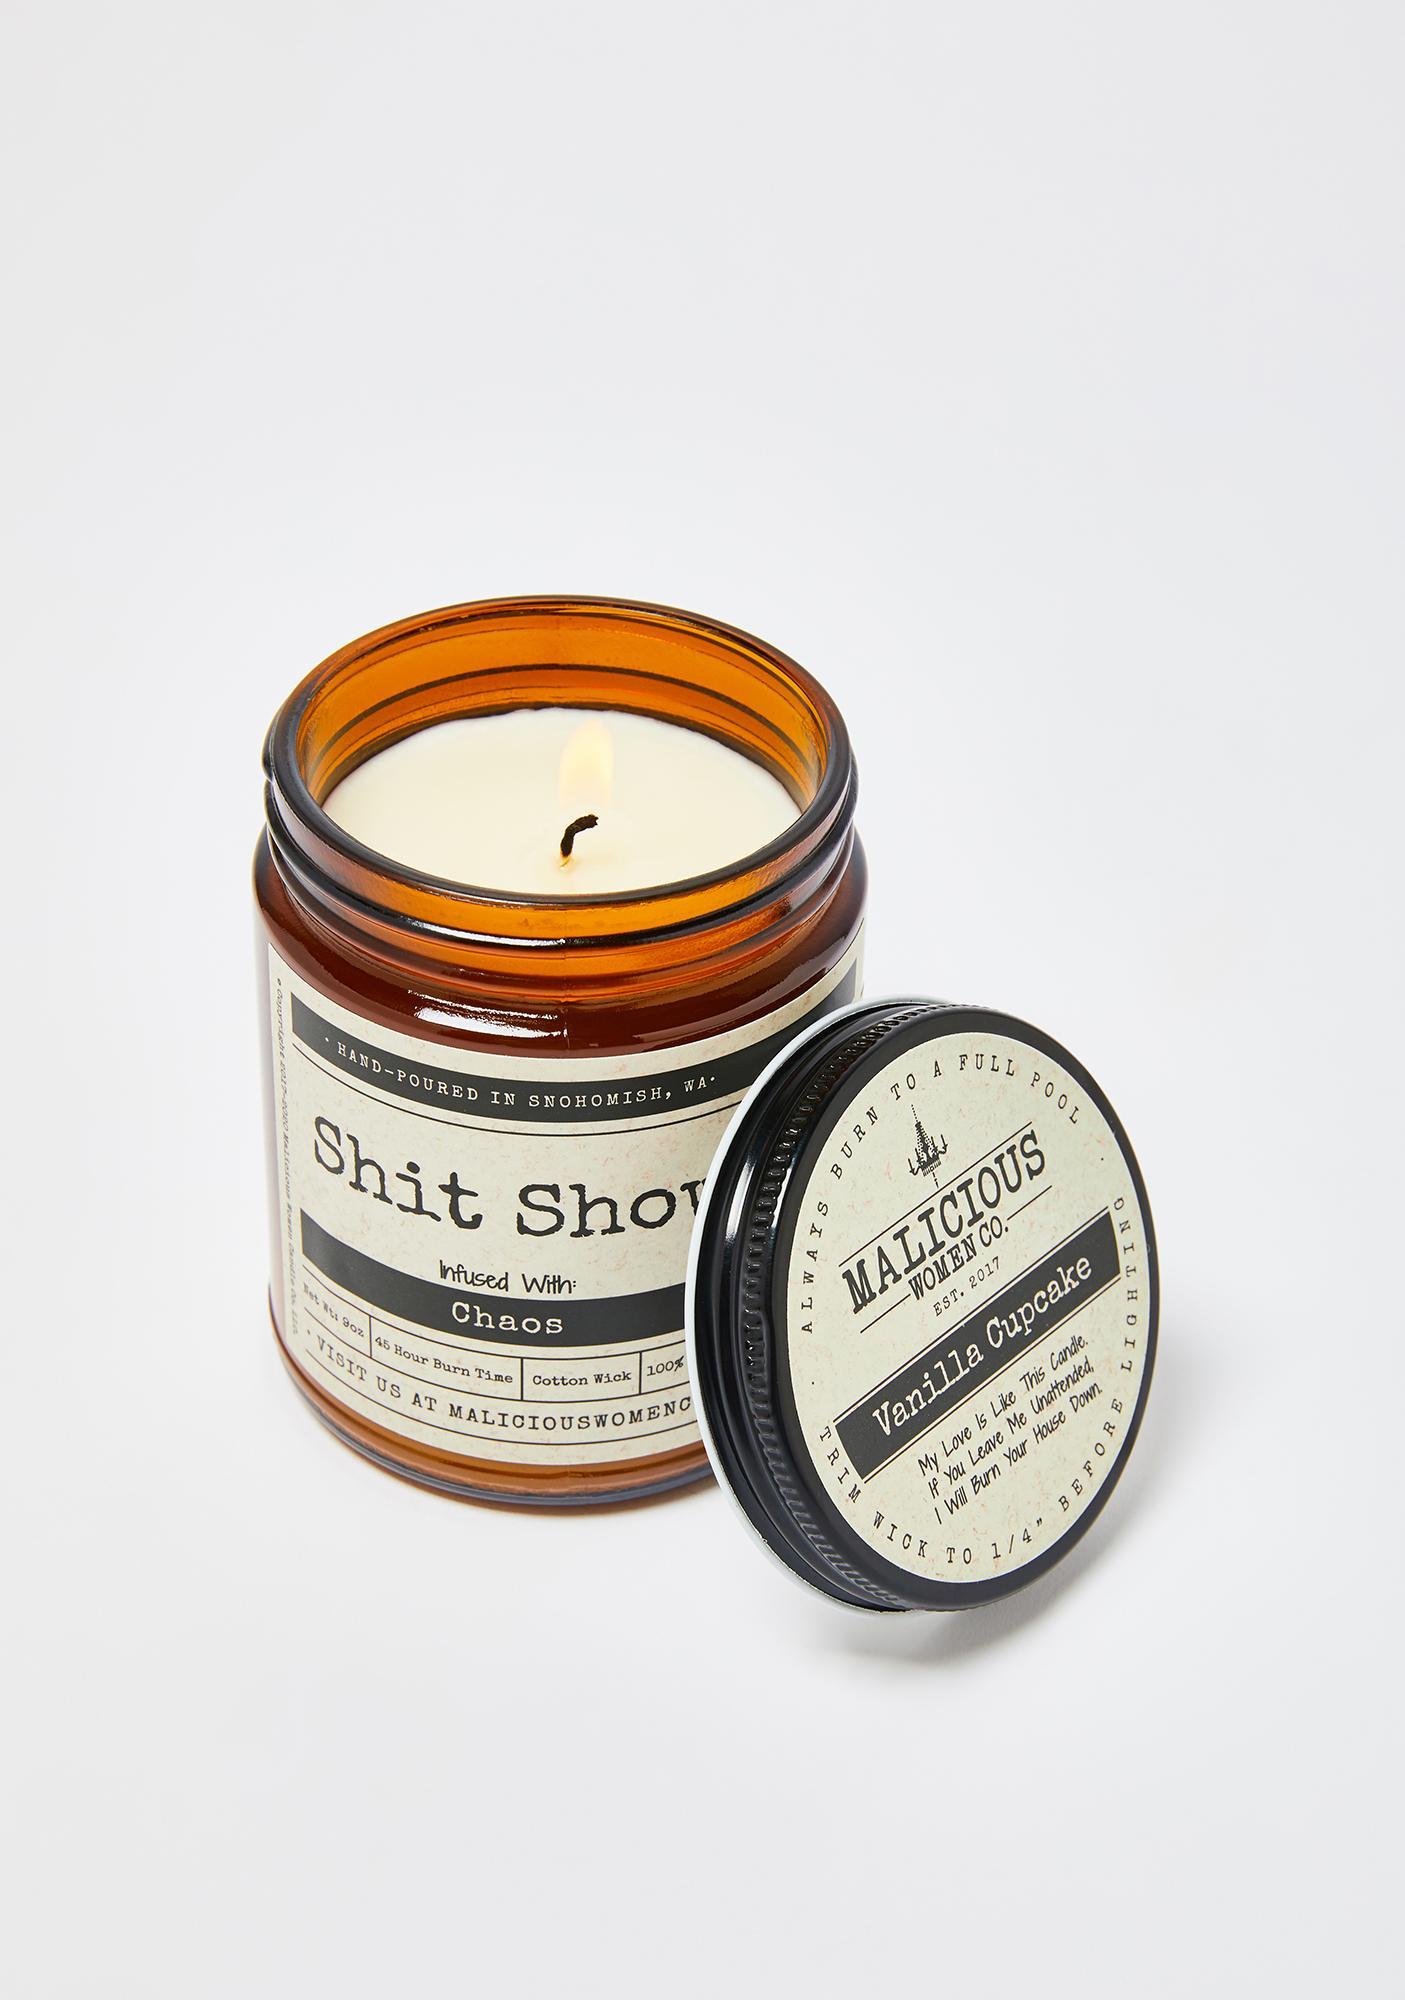 Malicious Women Company Shit Show Vanilla Cupcake Candle